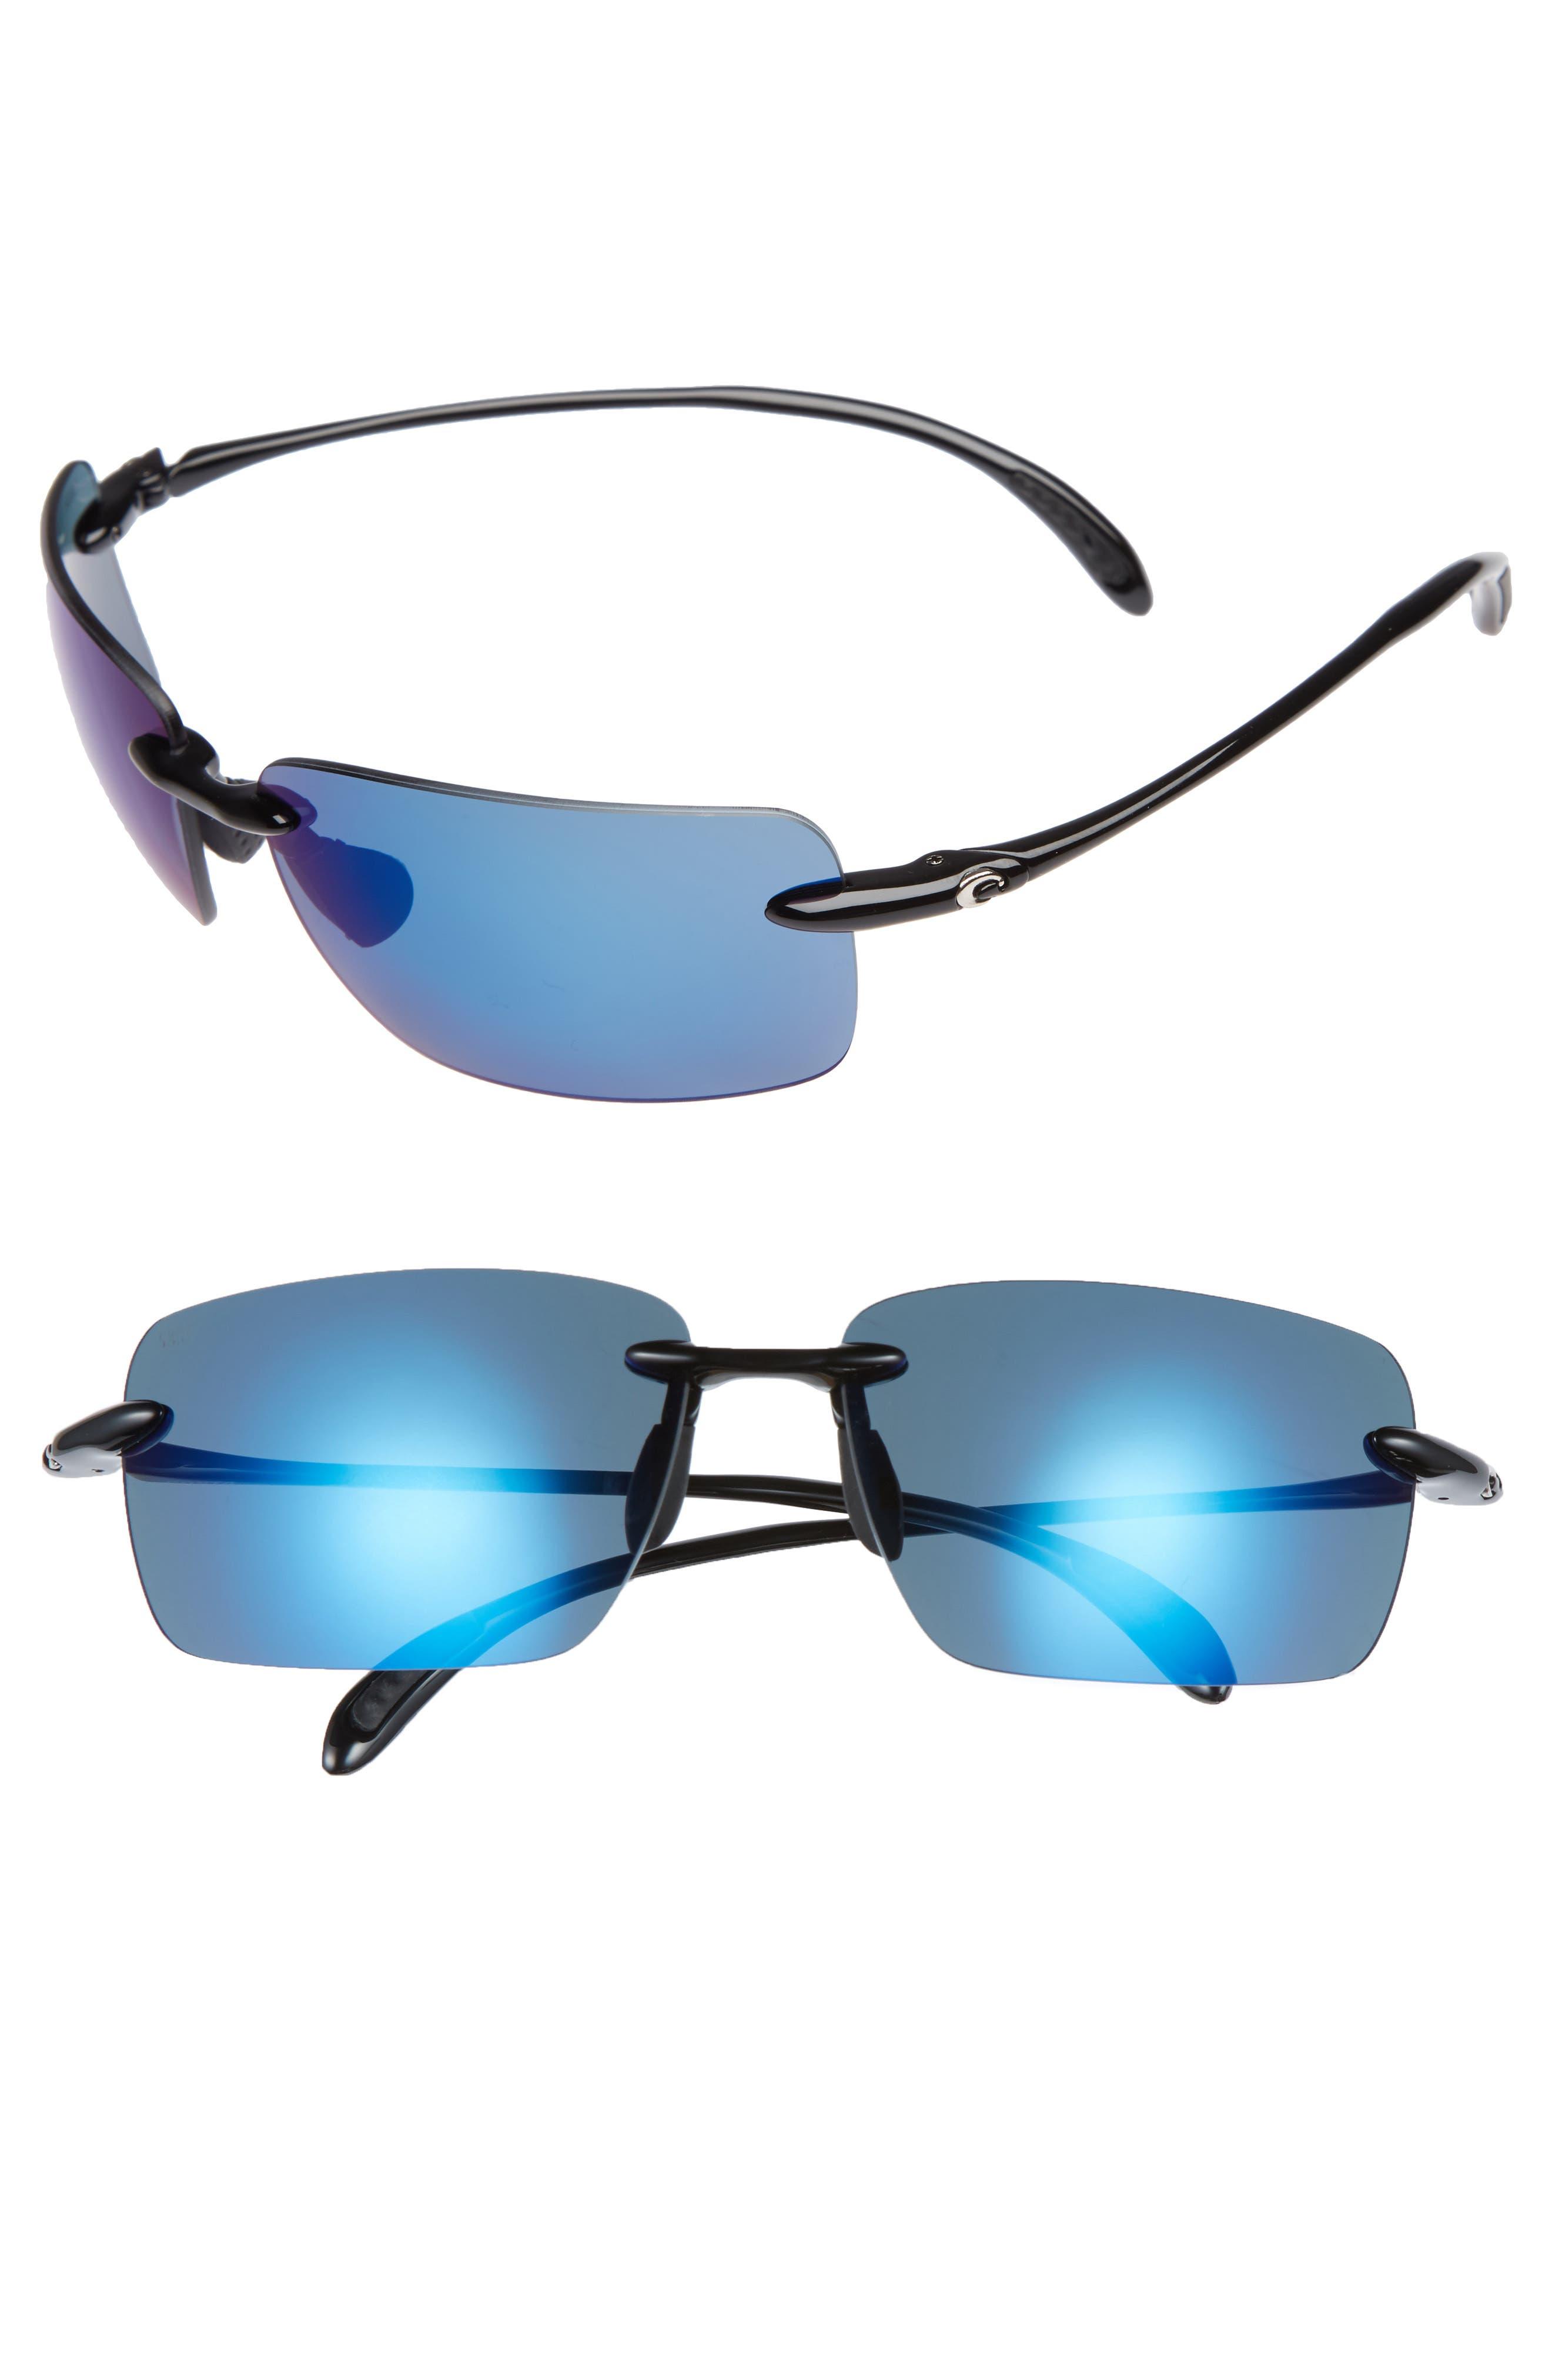 Gulfshore XL 66mm Polarized Sunglasses,                             Main thumbnail 1, color,                             BLACK/ BLUE MIRROR